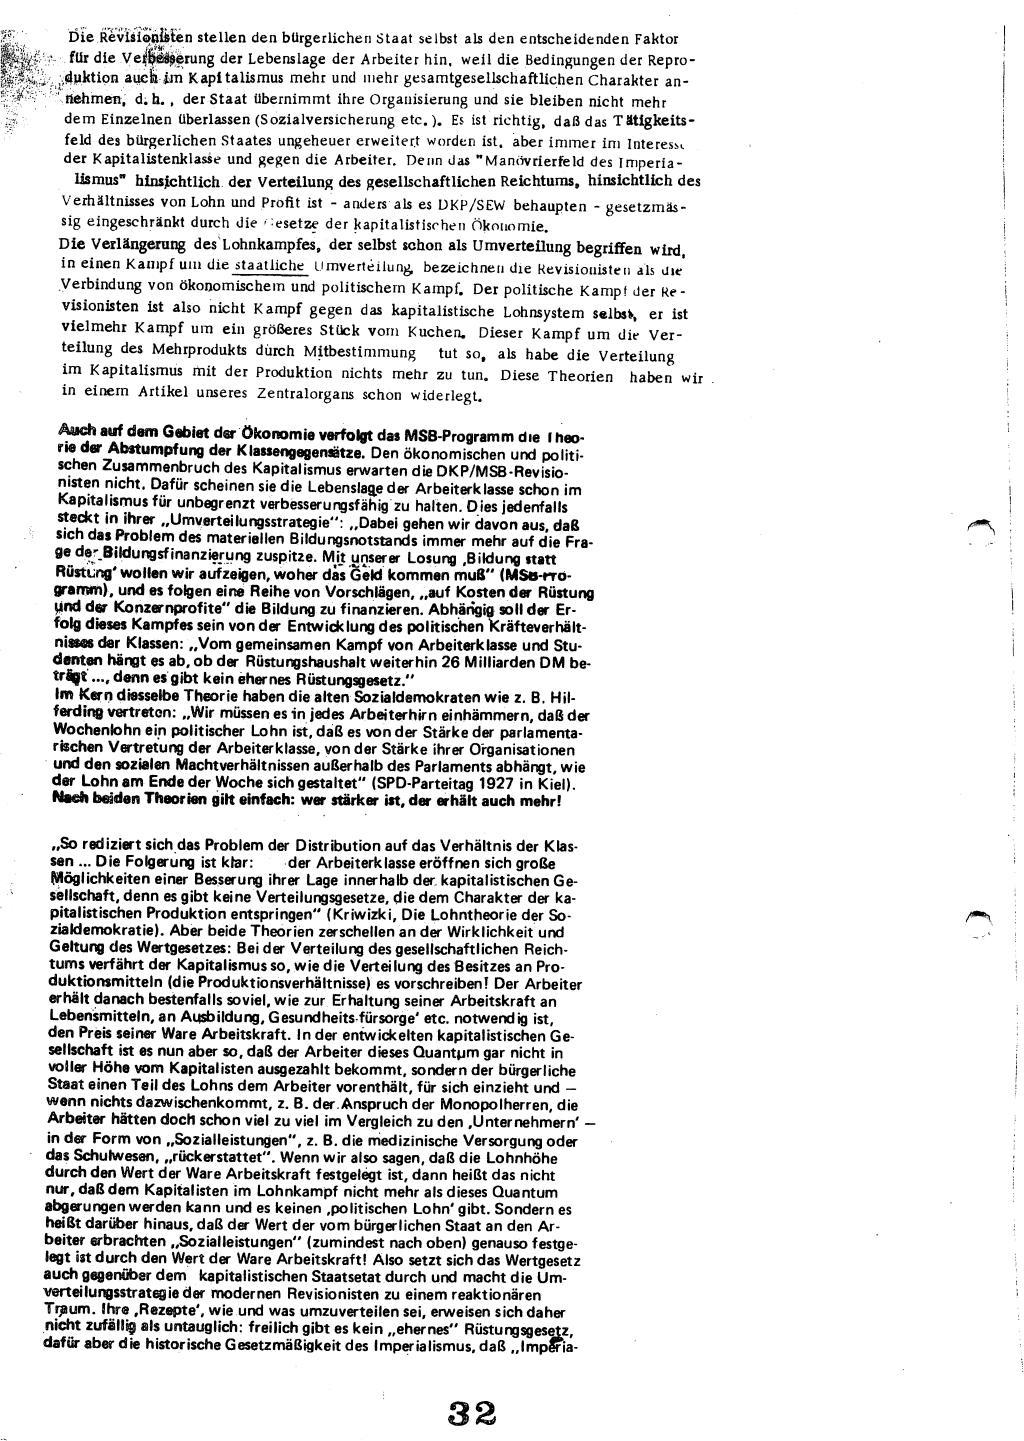 KSV_Grundschulung_1975_01_51